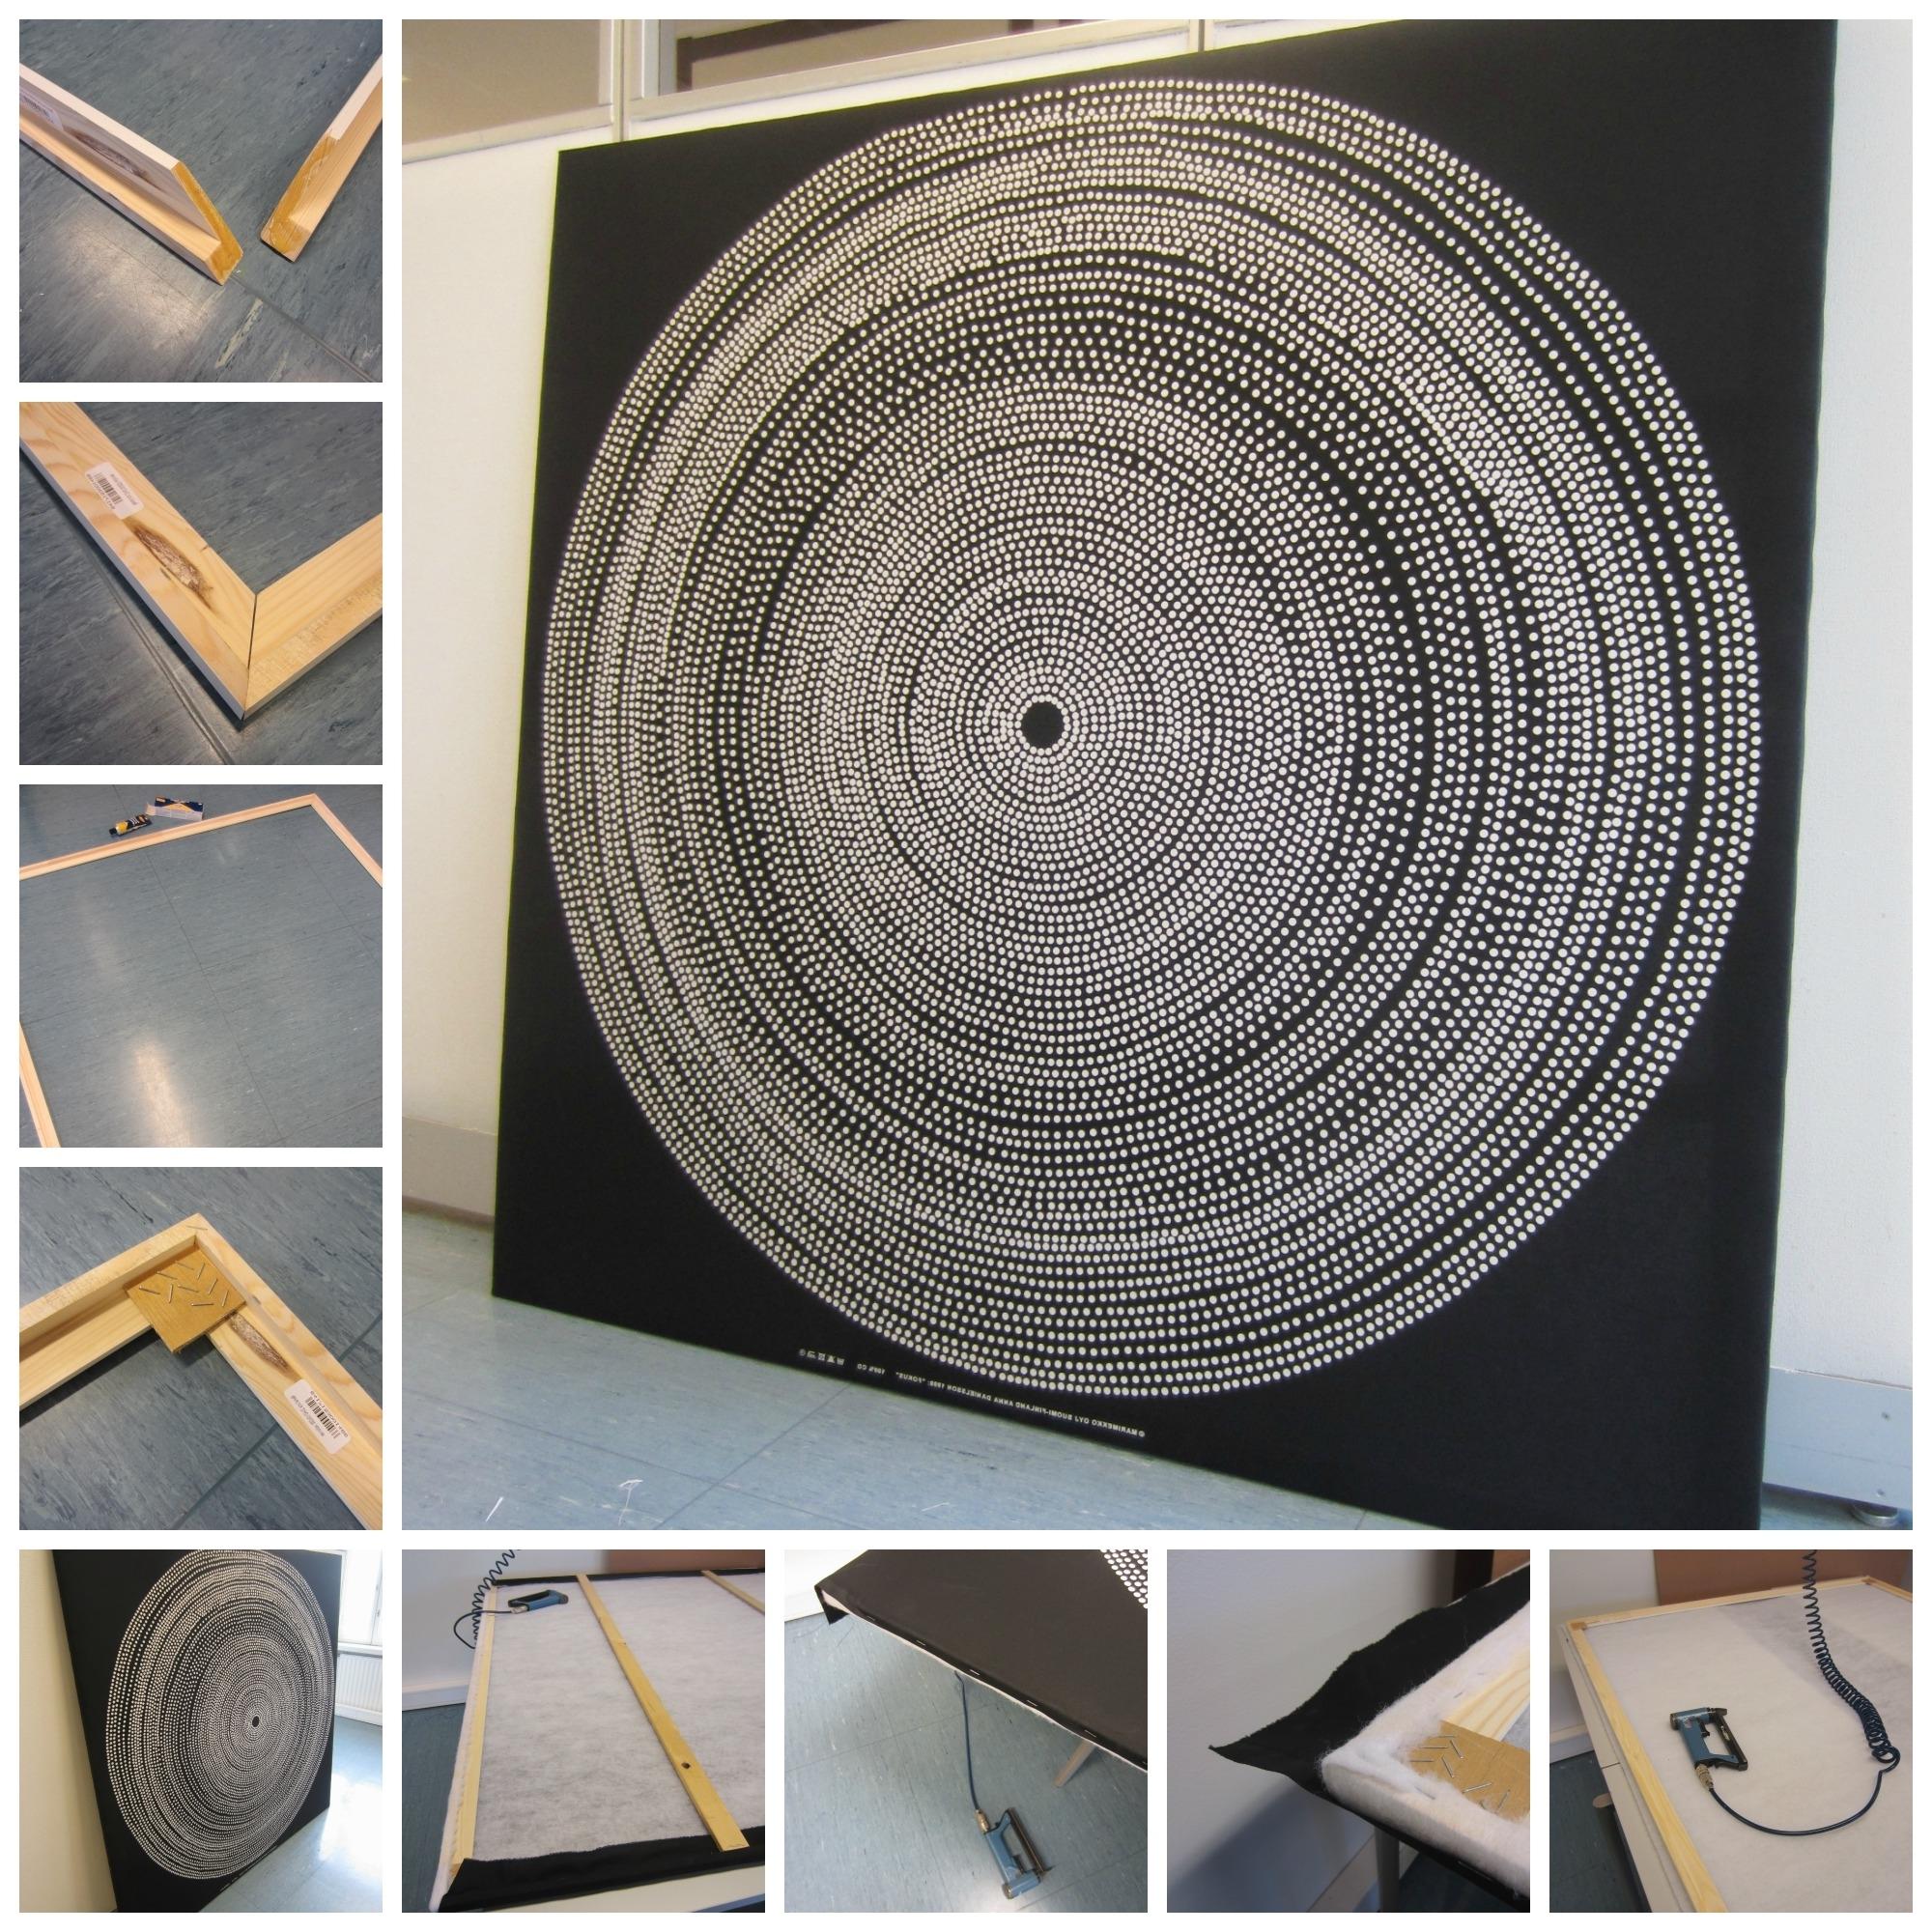 Preferred Tee Se Itse Naisen Sisustusblogi: Fabric Board Wall Out Of Within Marimekko 'karkuteilla' Fabric Wall Art (View 12 of 15)